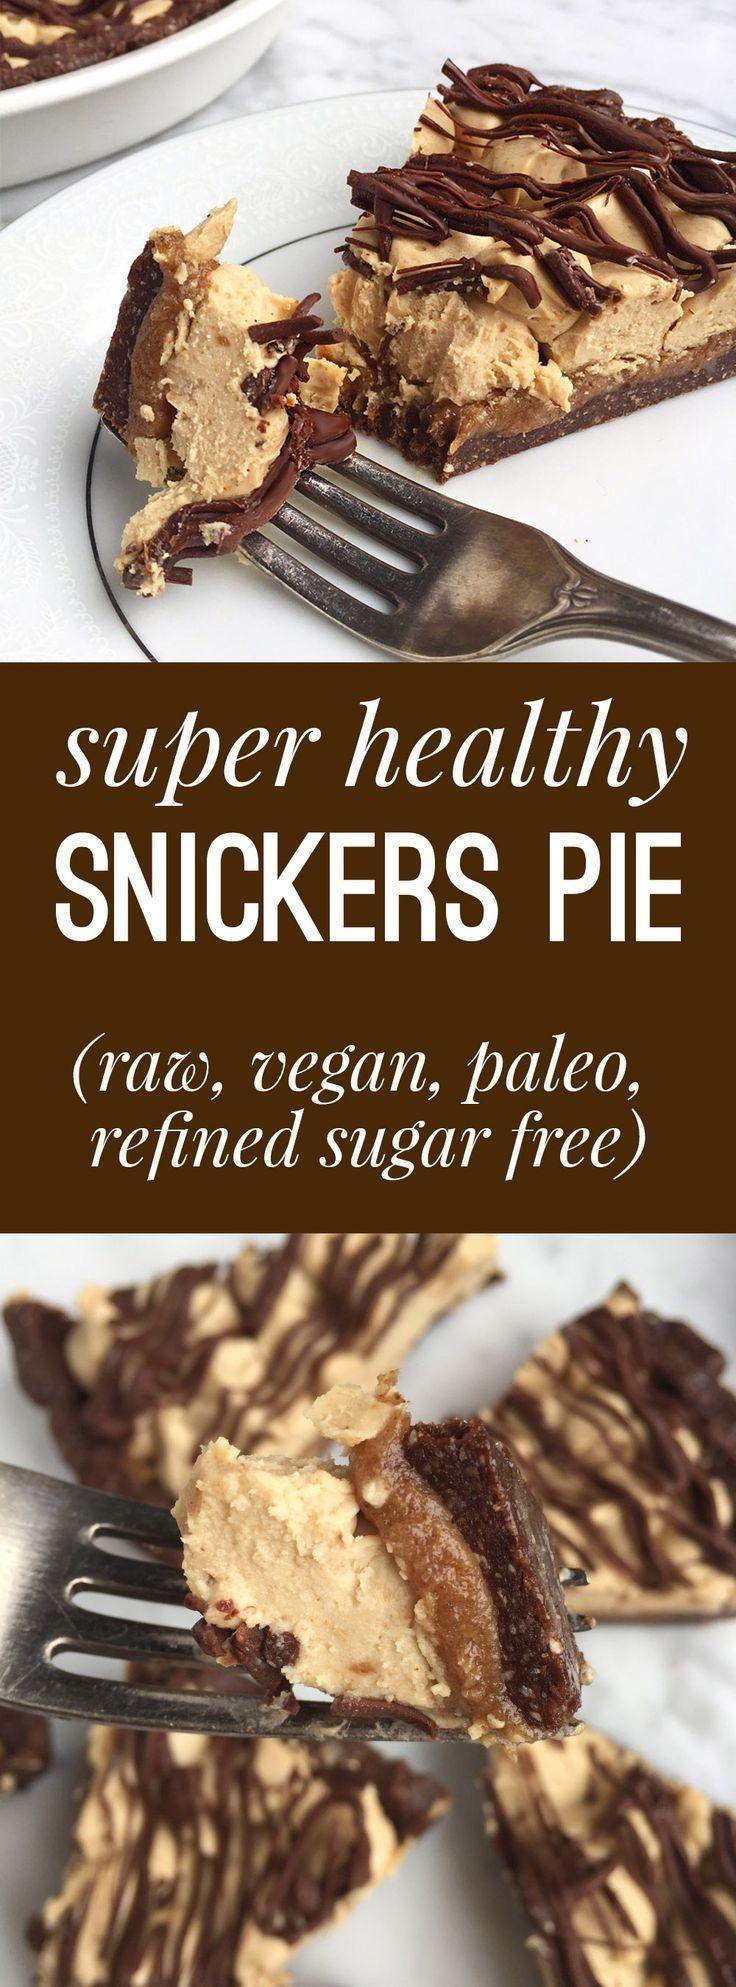 Raw, gluten free, vegan, paleo, refined sugar free and AMAZING tasting! The caramel layer is ridicu